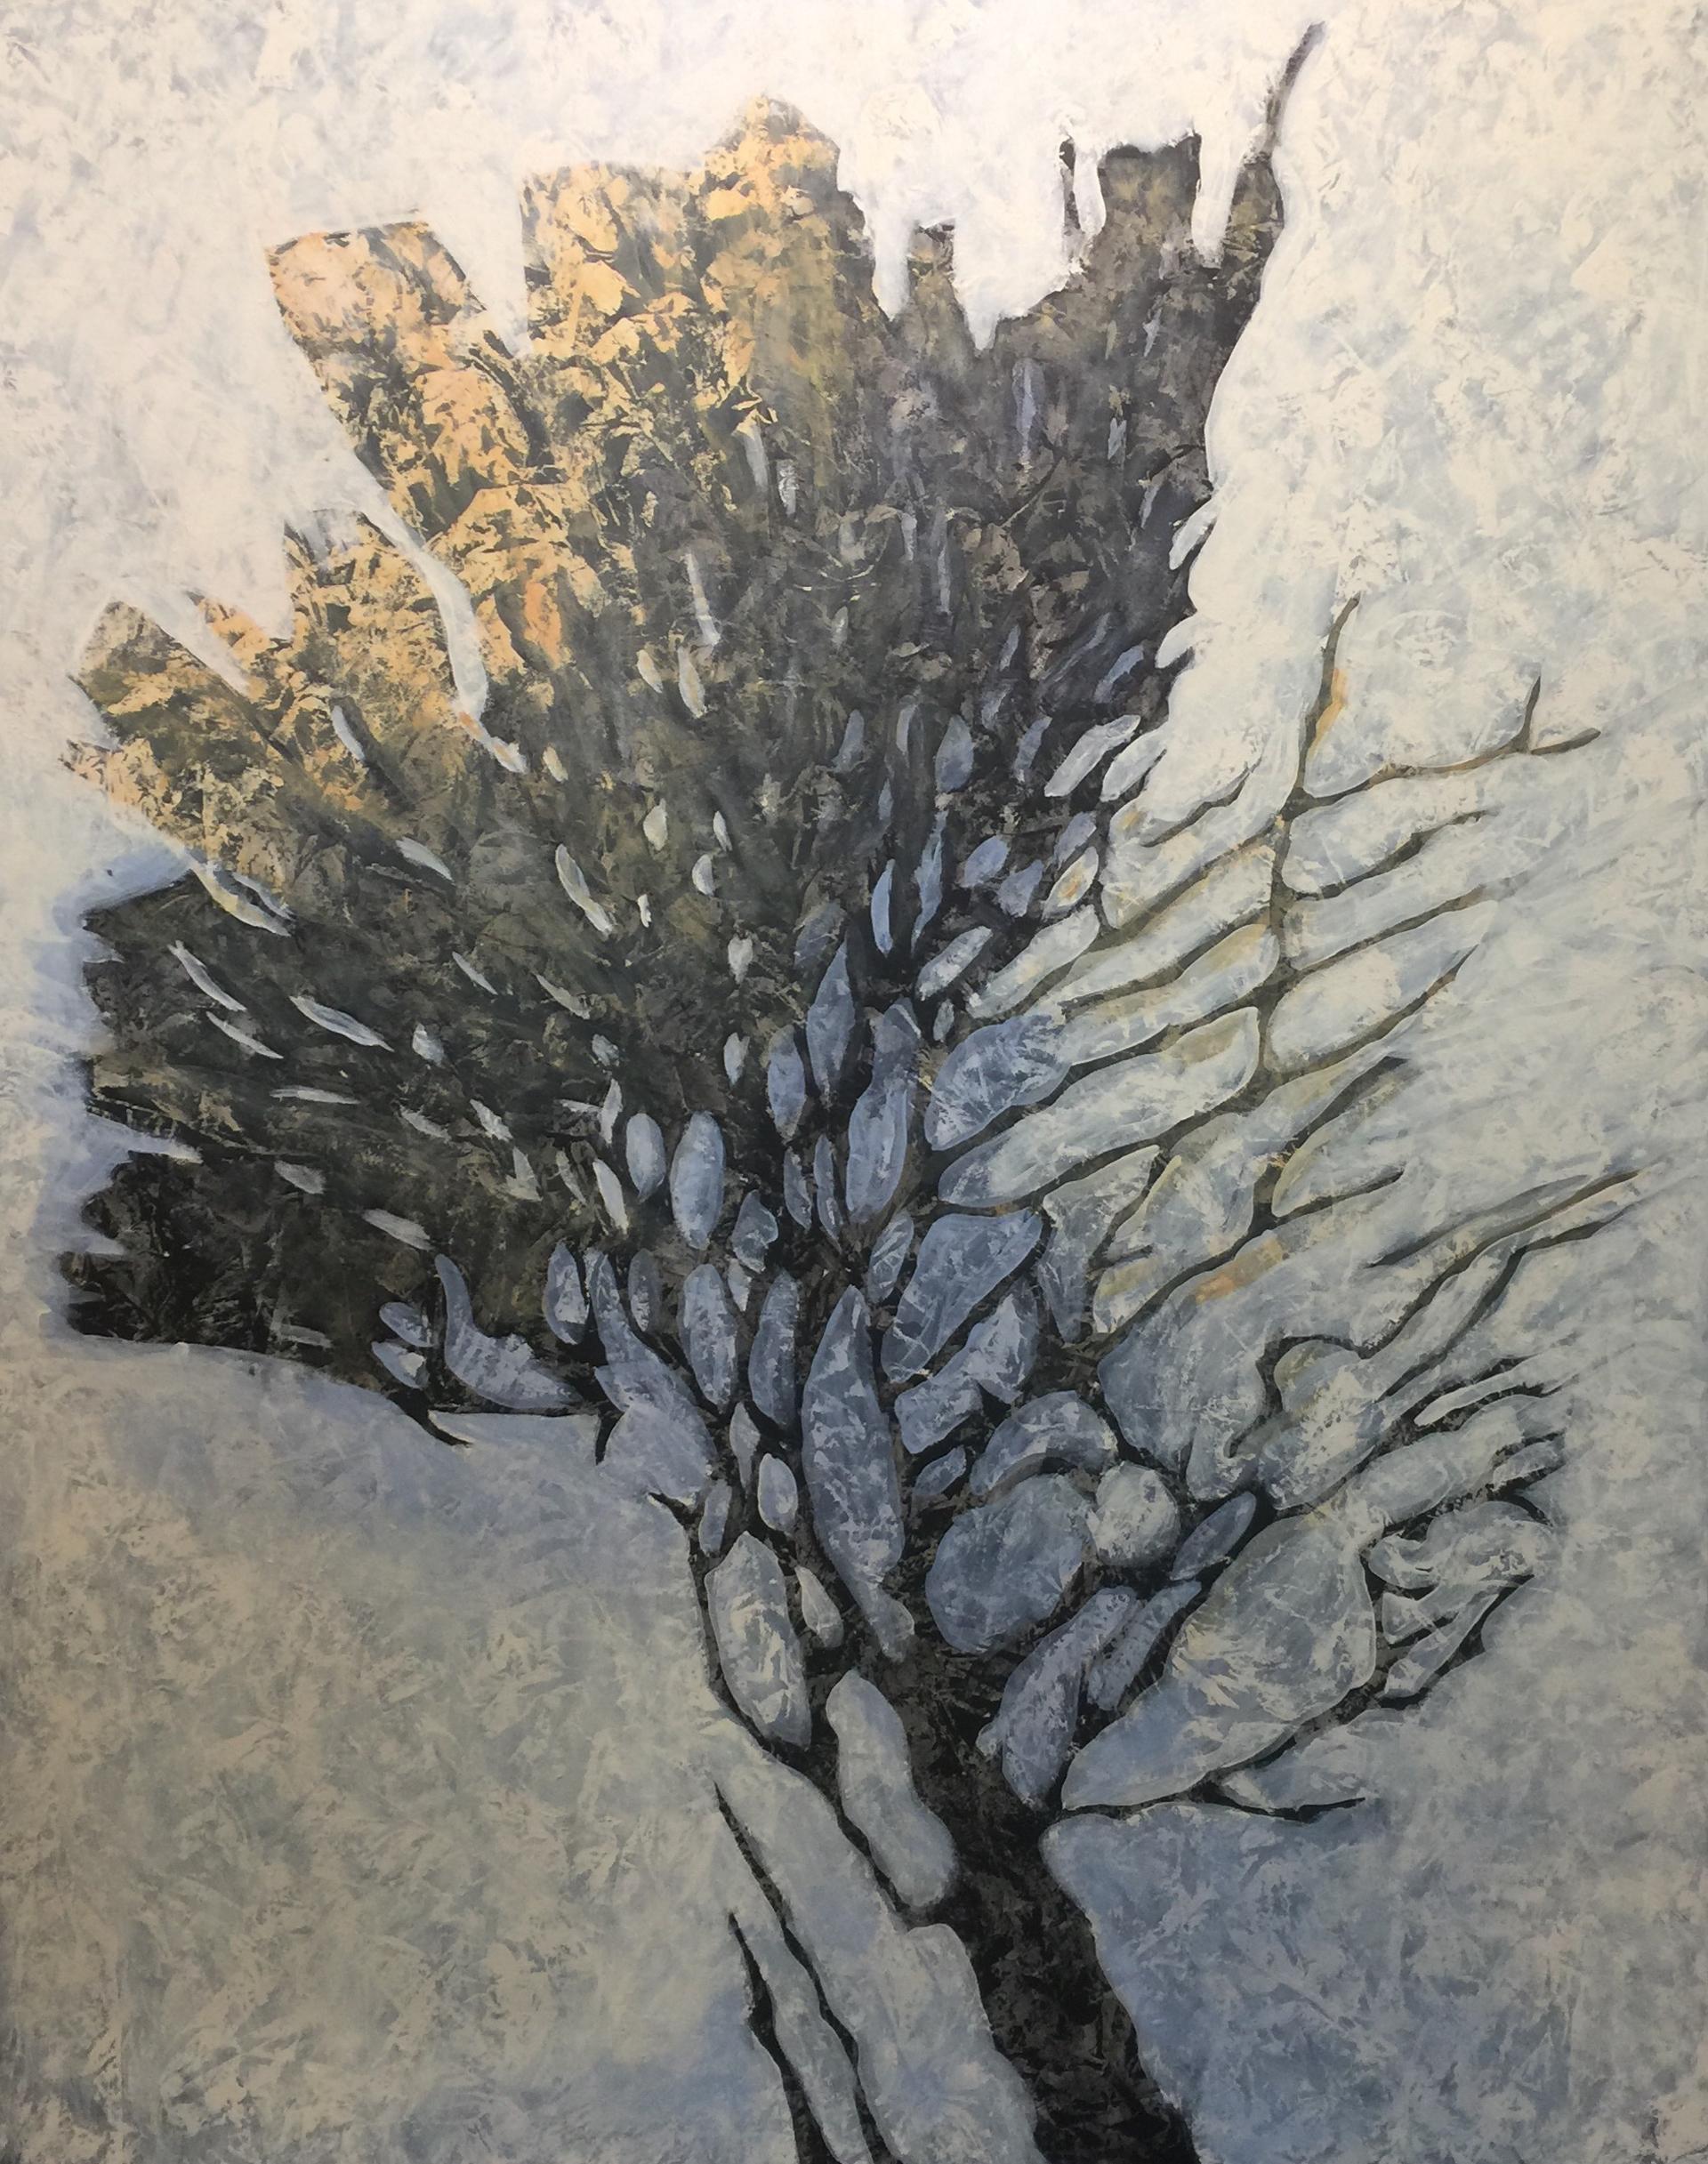 Magic Bush by John Townsend